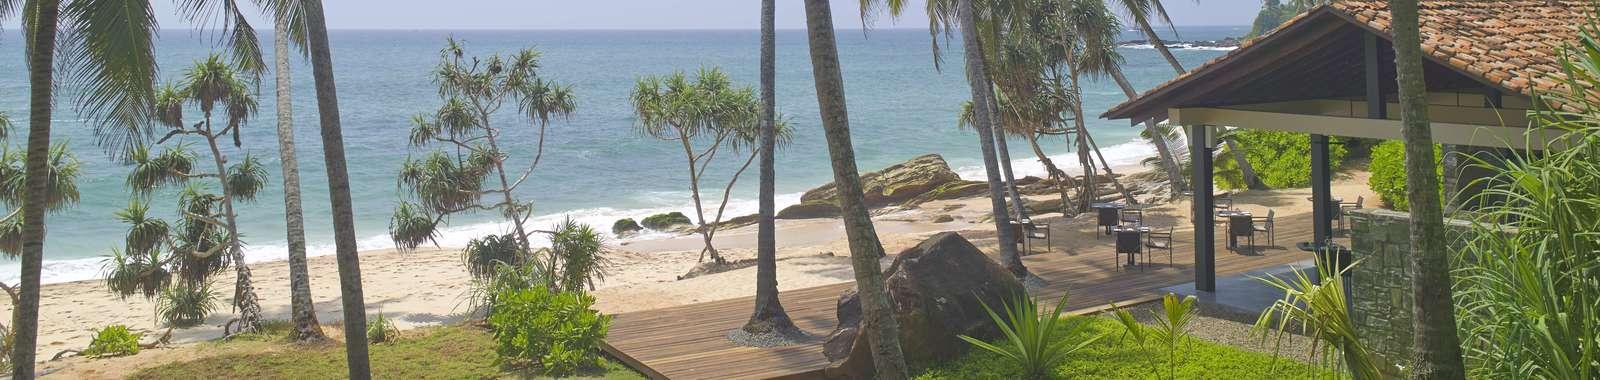 111RS708_Amanwella-BeachClub